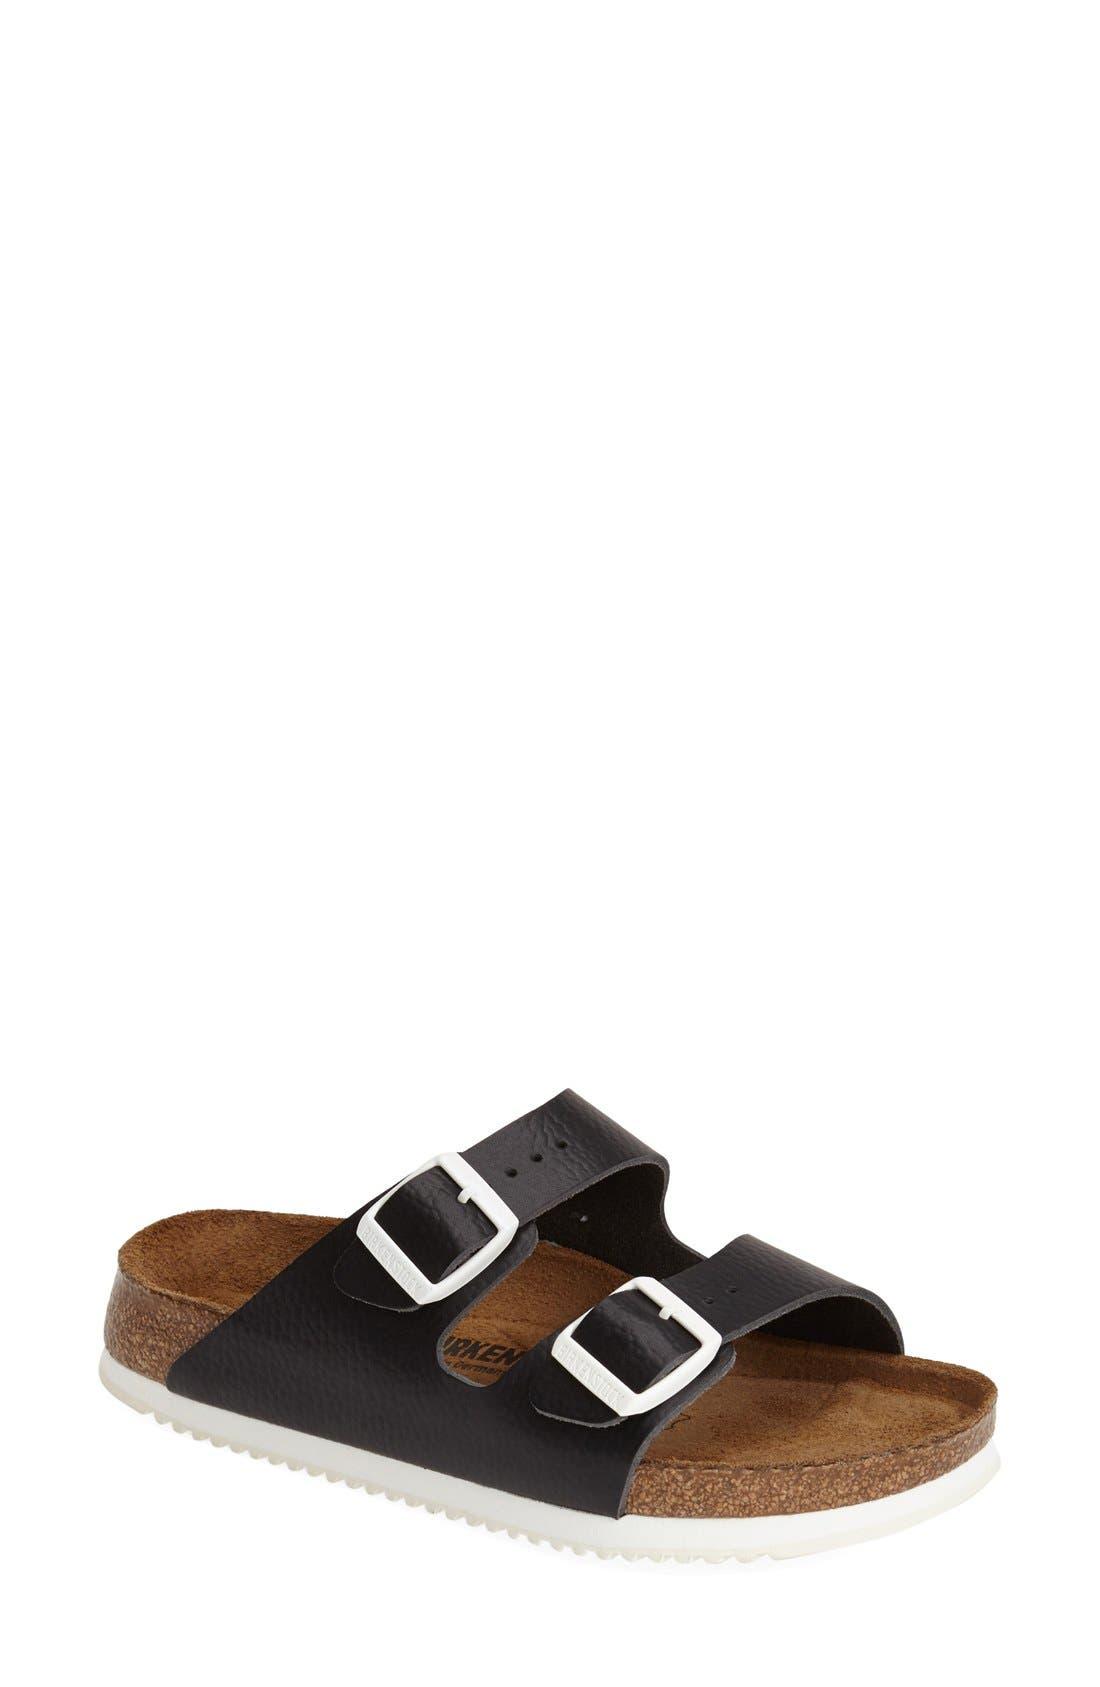 BIRKENSTOCK,                             'Arizona' Leather Double Band Footbed Sandal,                             Main thumbnail 1, color,                             001